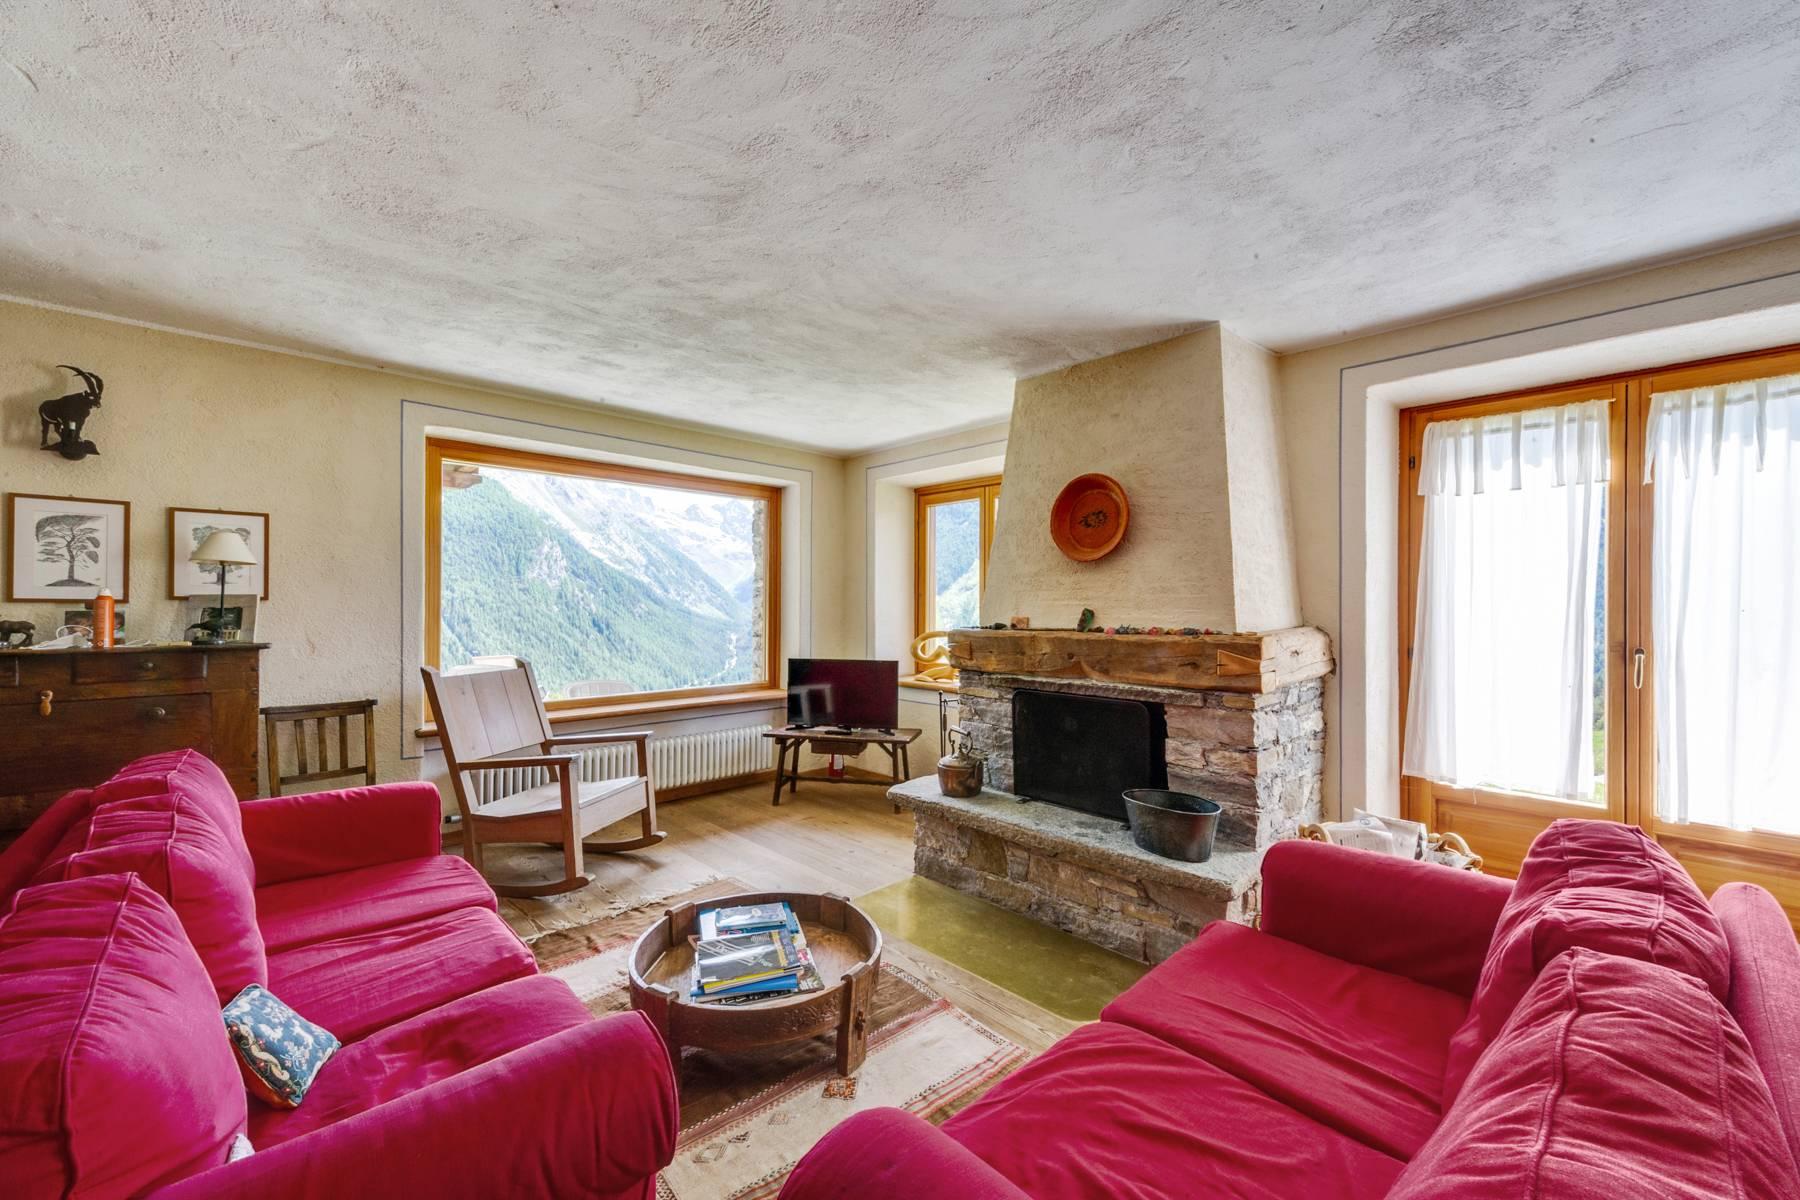 Villa in Vendita a Cogne: 5 locali, 377 mq - Foto 23